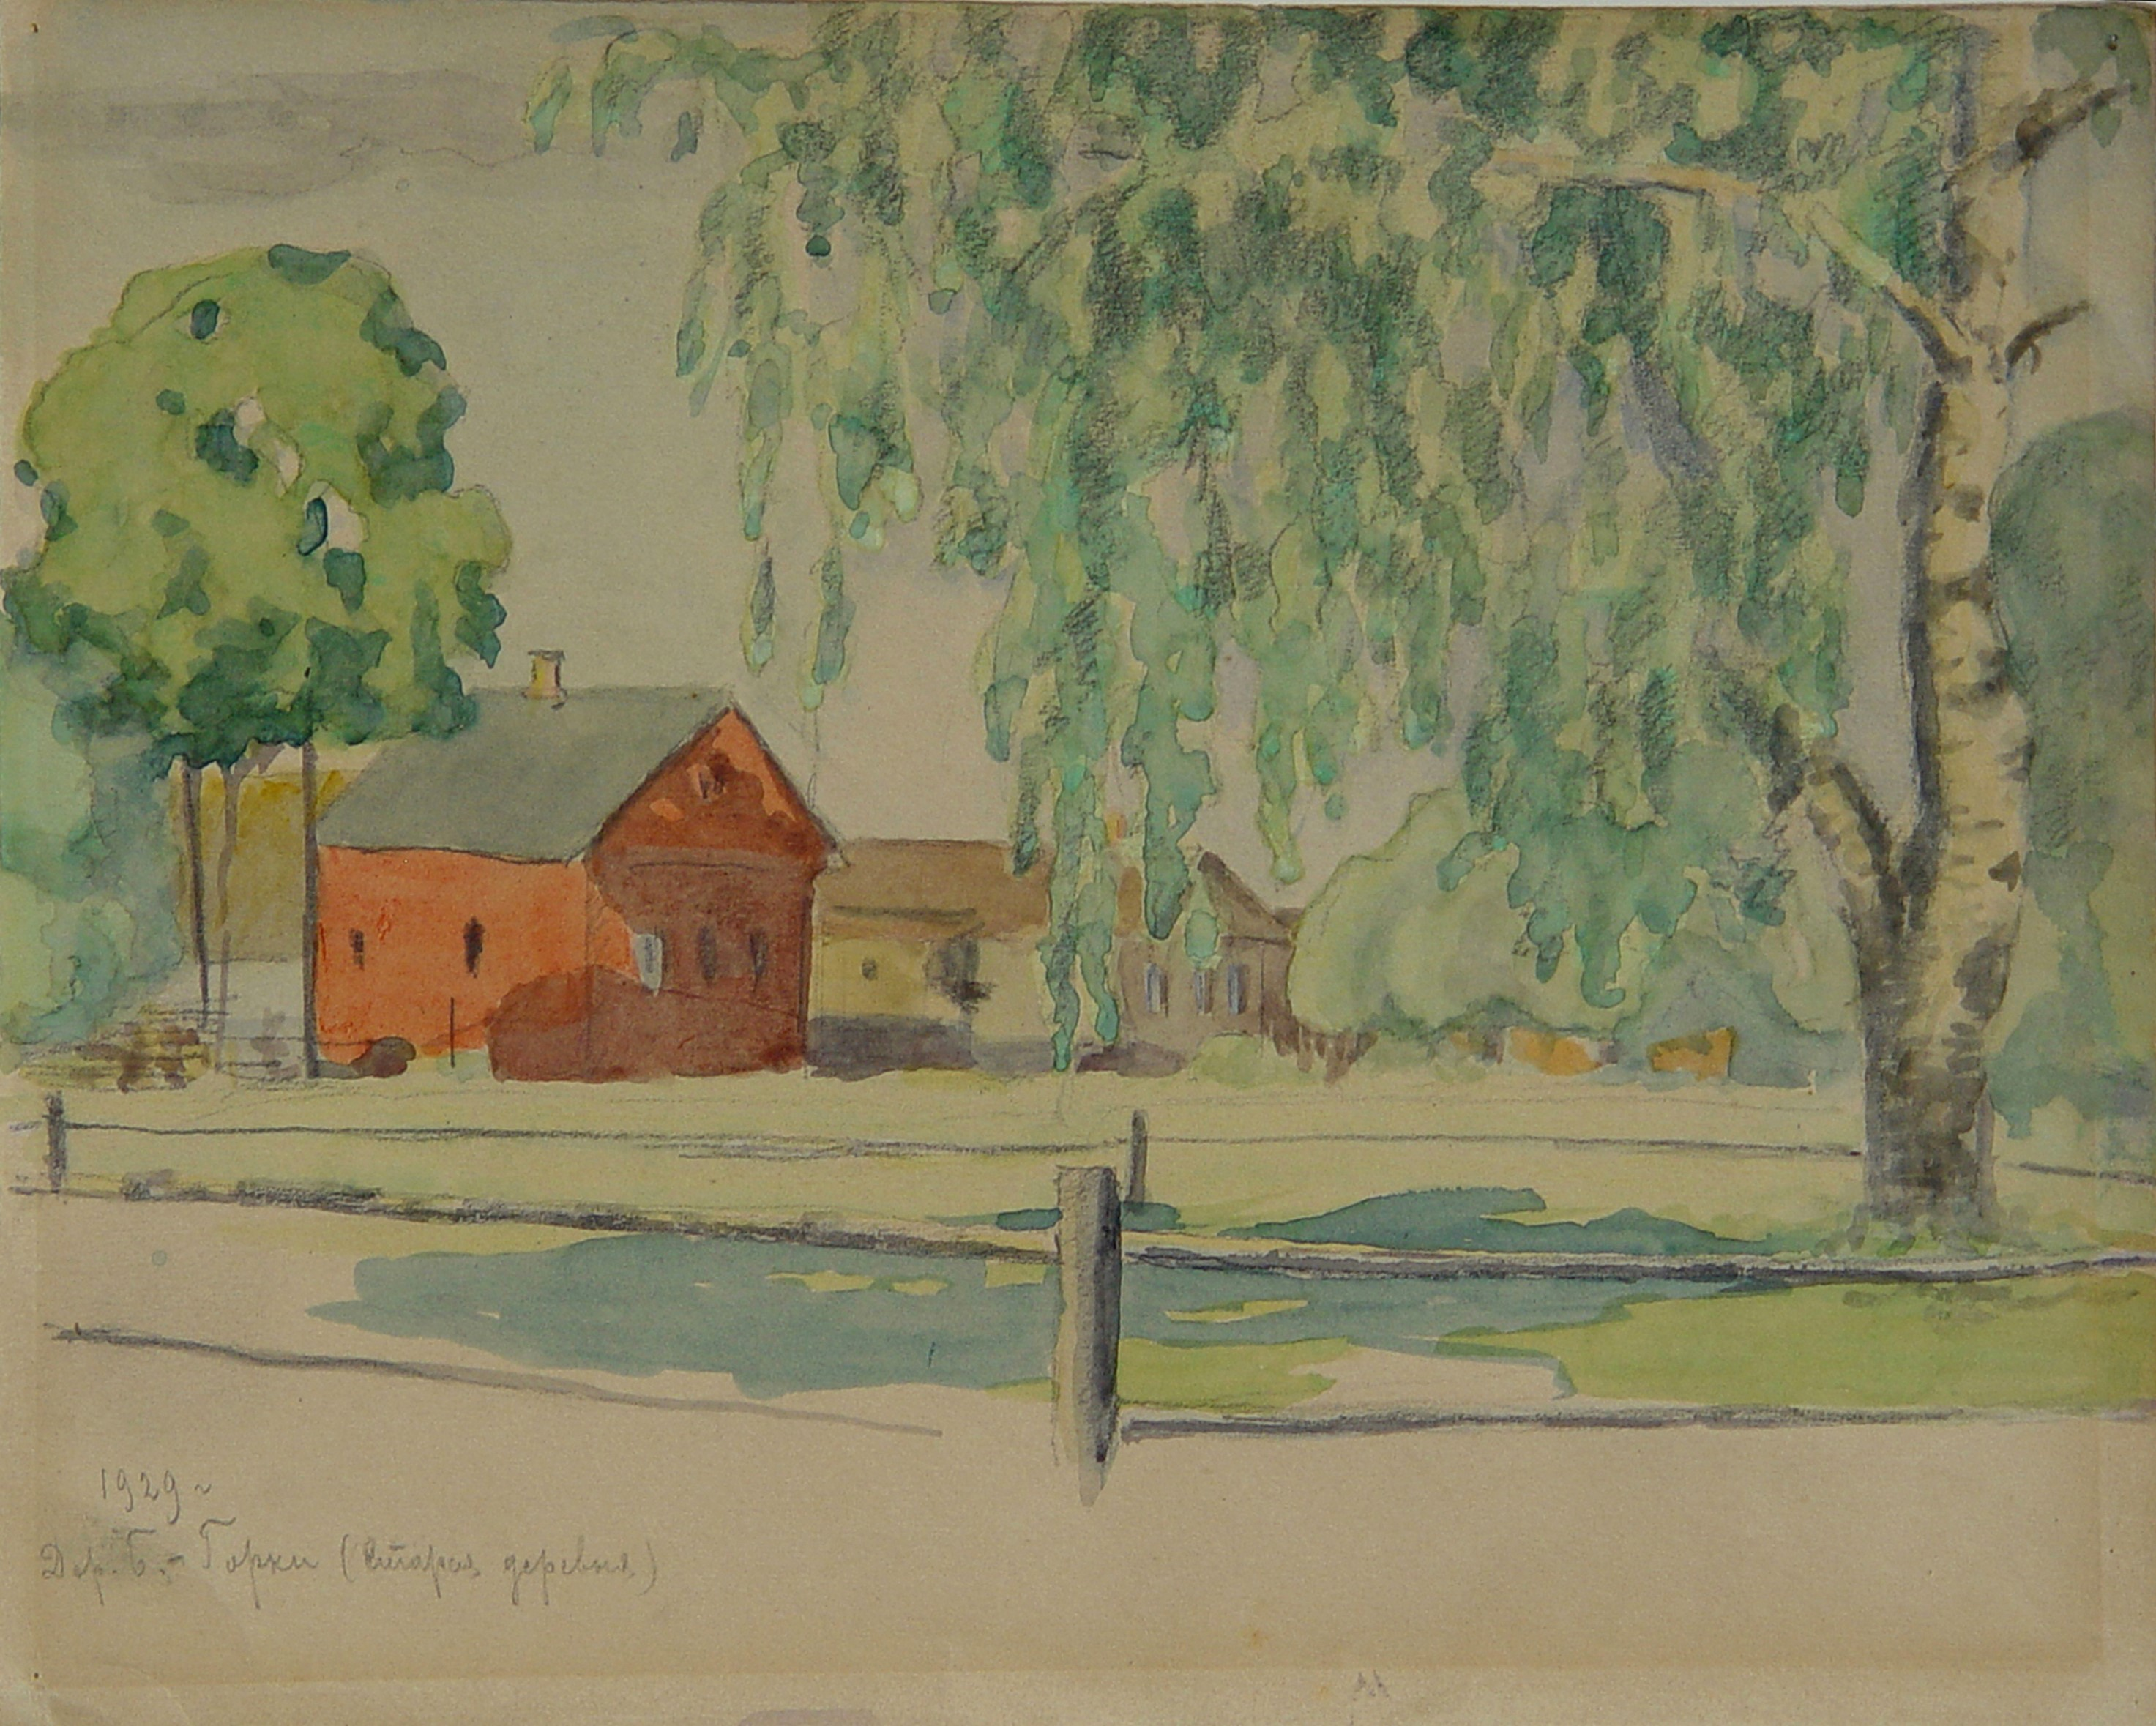 Ivan Kliun (Russian, 1873-1942), Village B. Gorki (the second village), 1929, watercolor